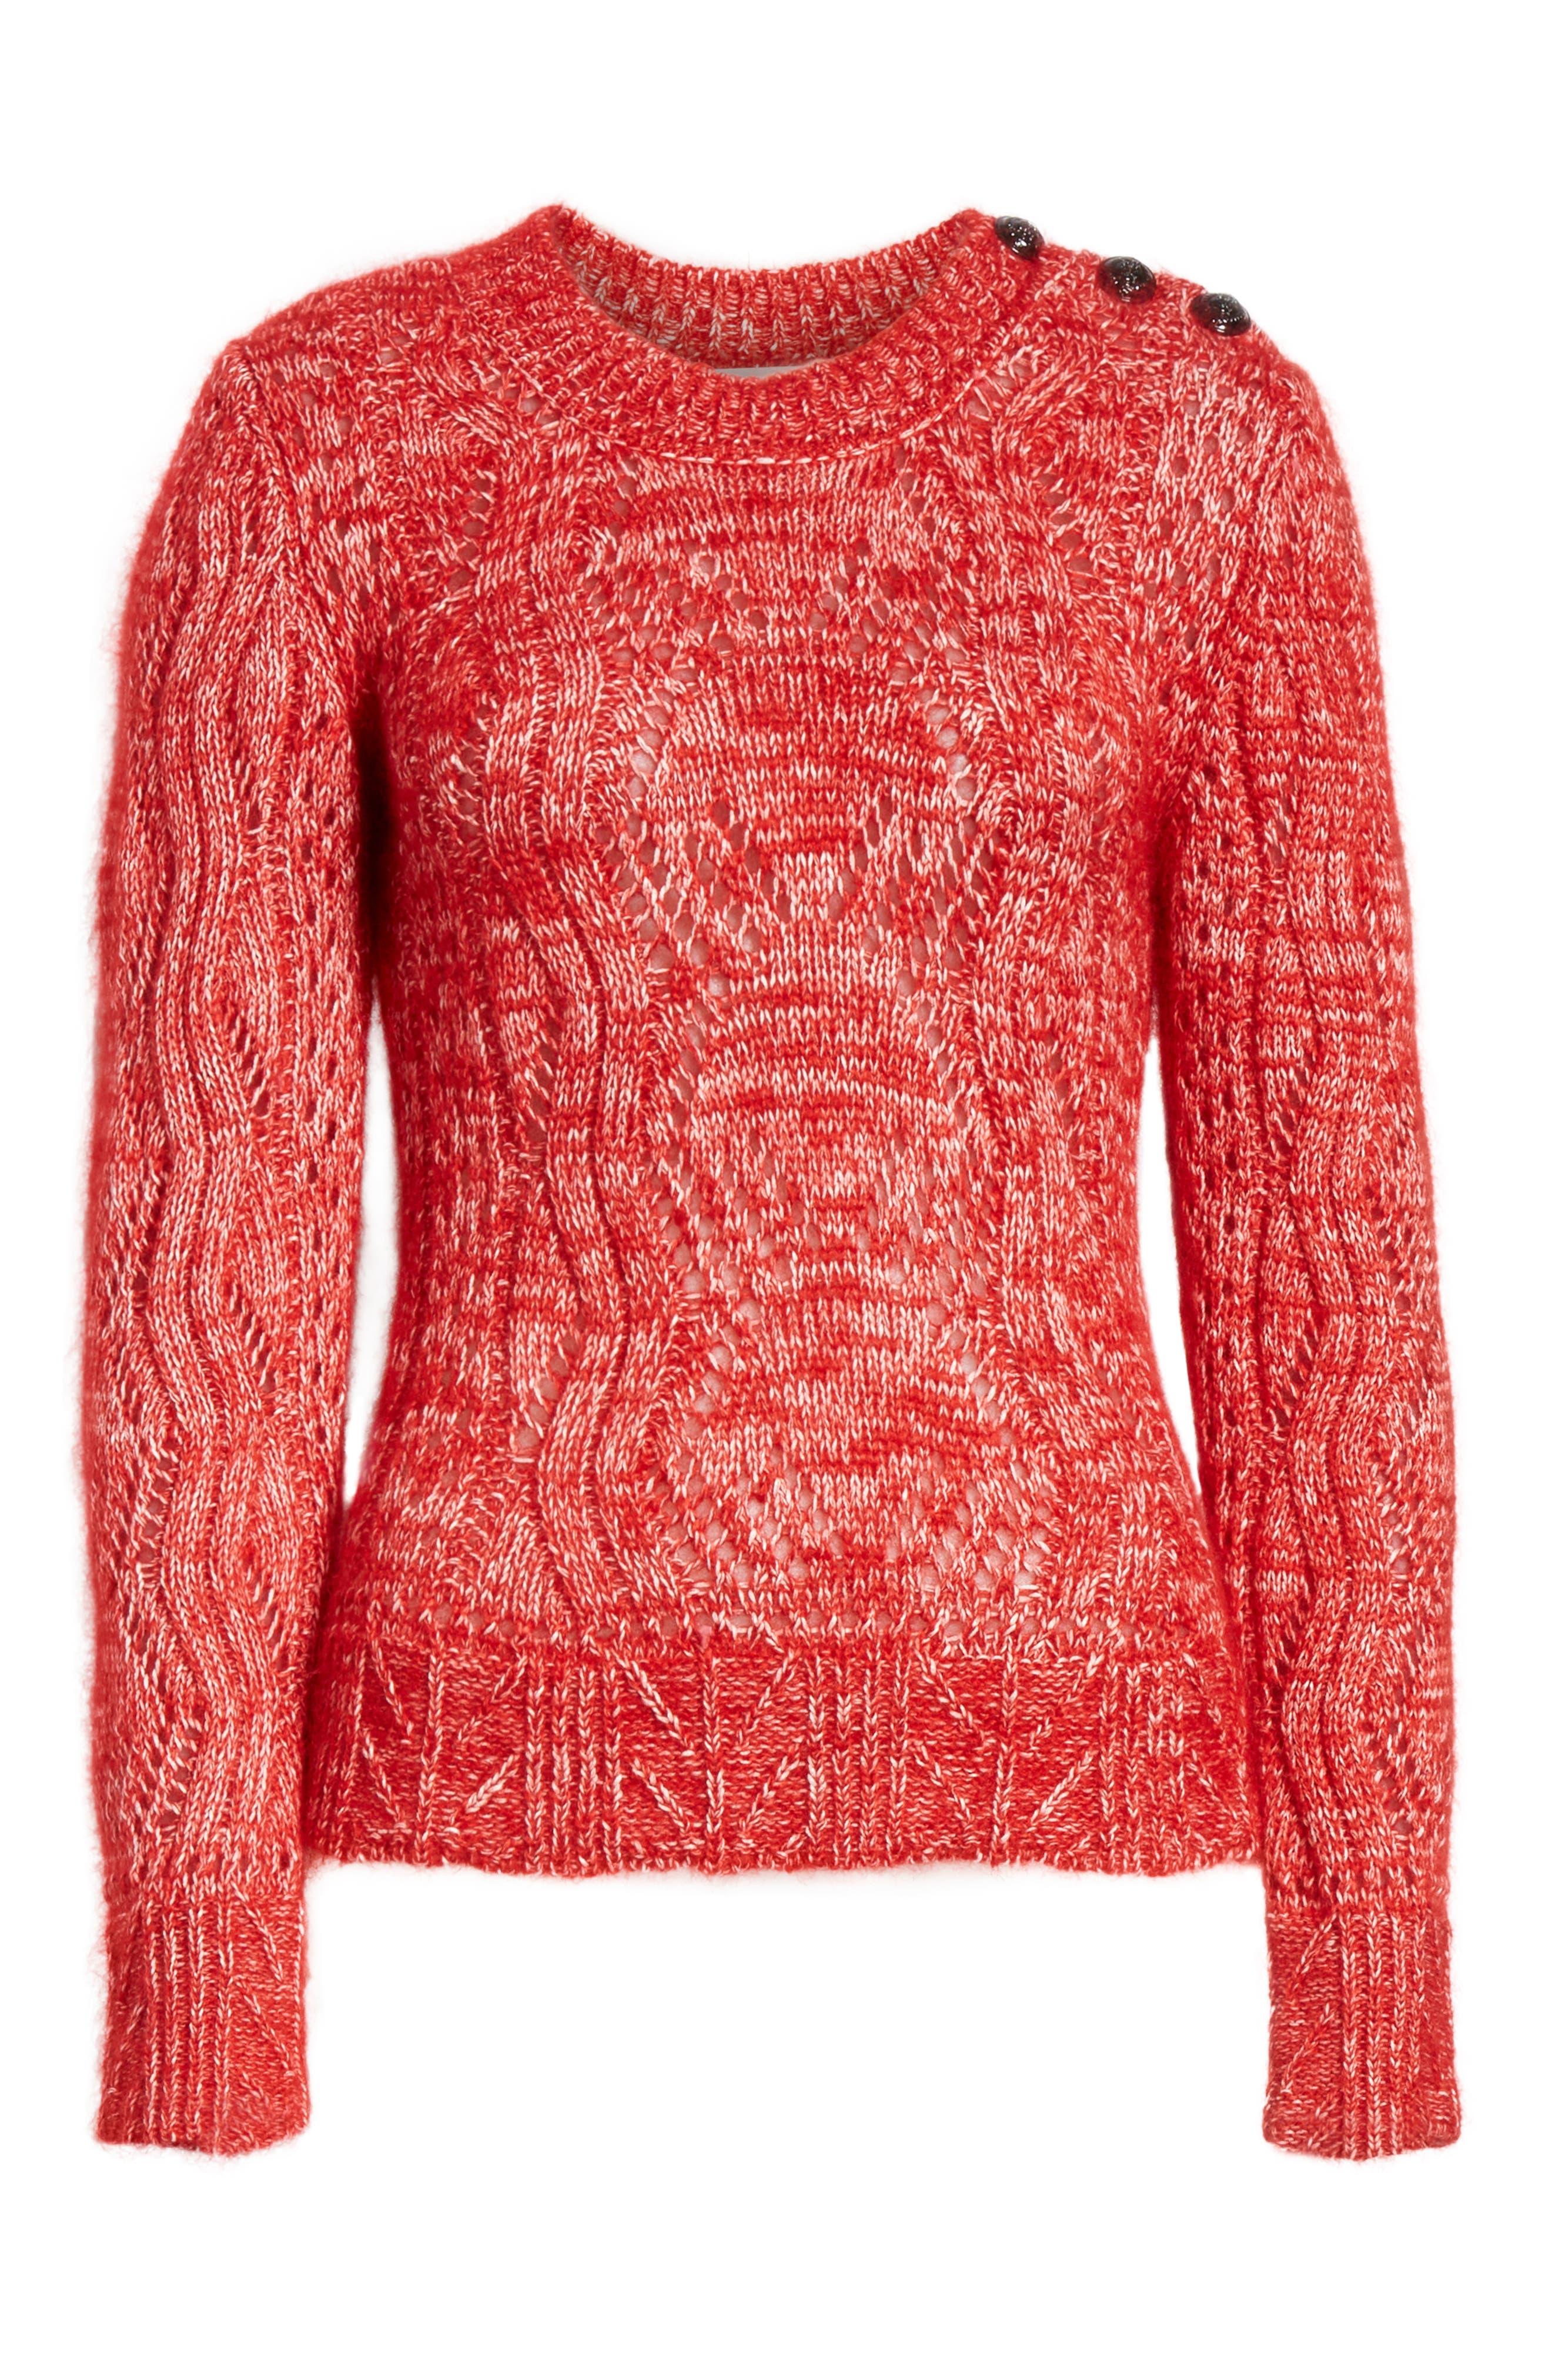 Numa Cotton & Silk Blend Sweater,                             Alternate thumbnail 6, color,                             600